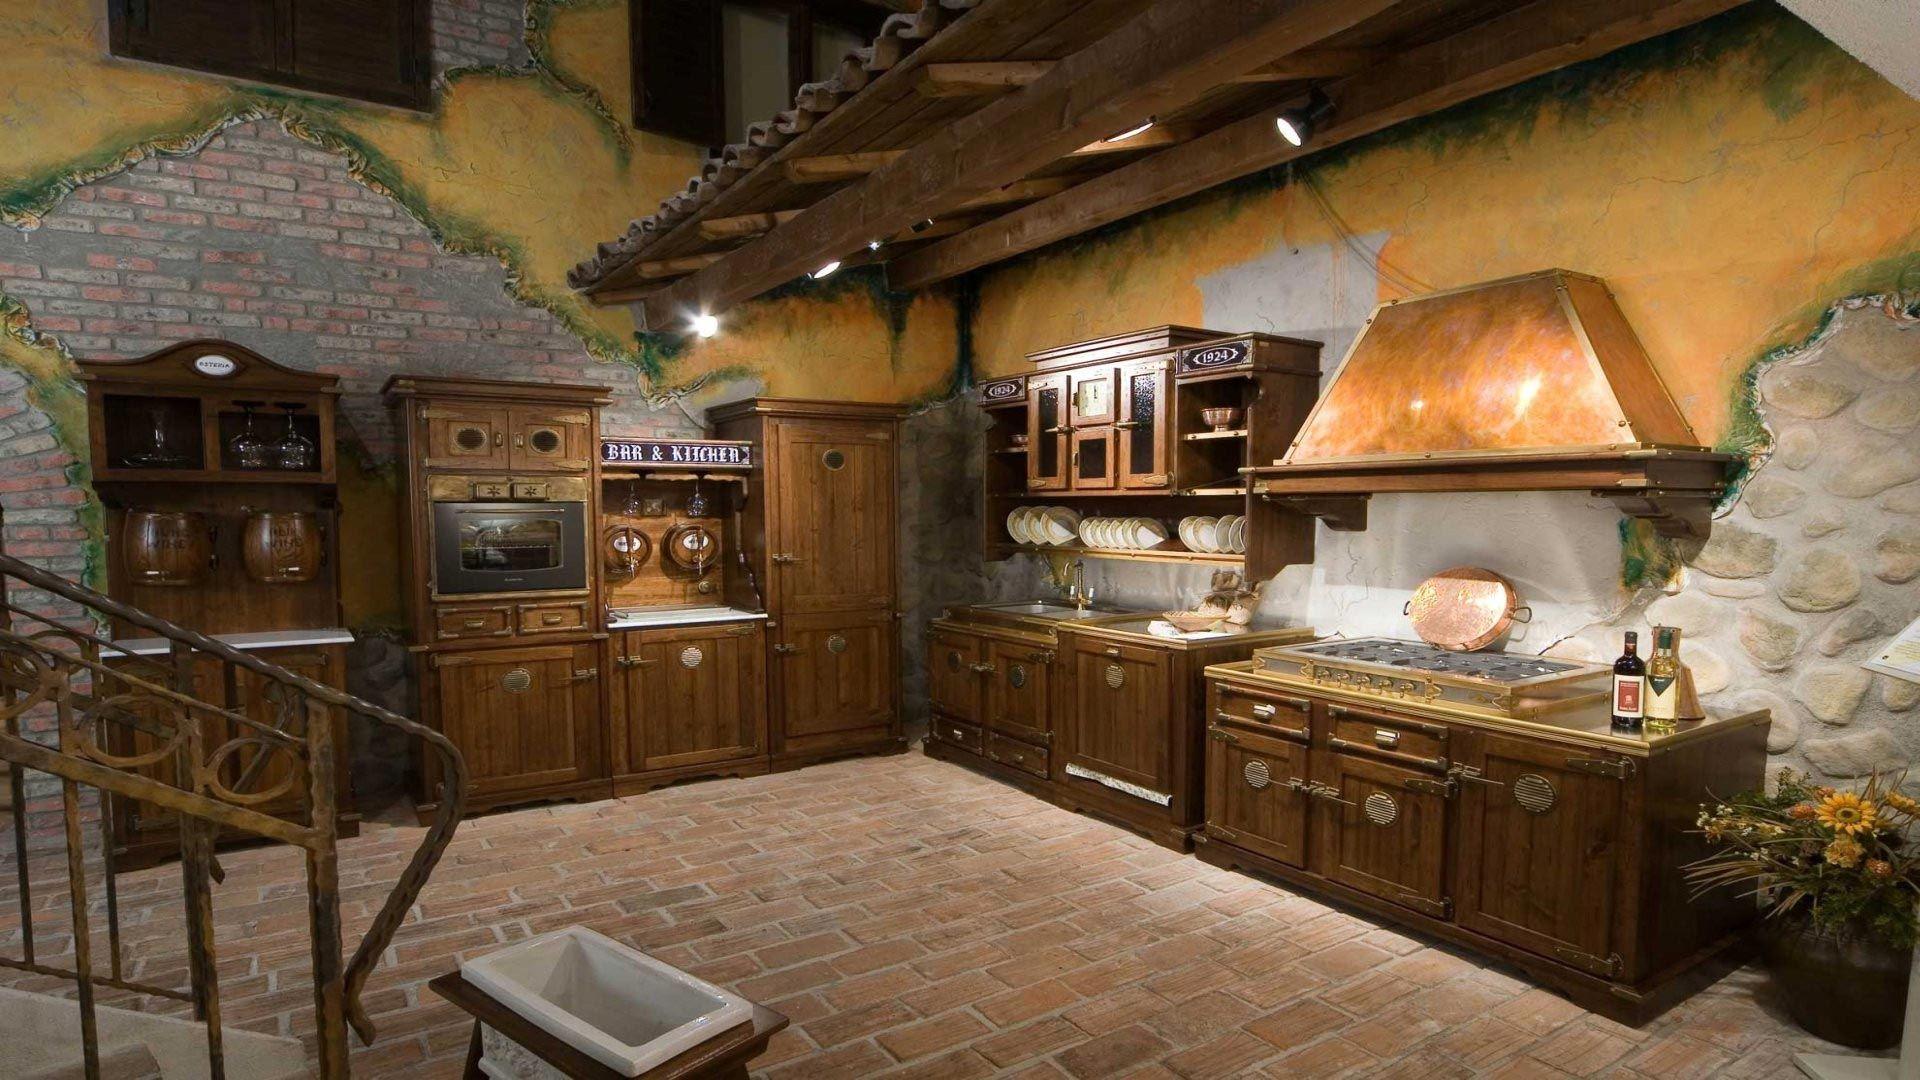 Cucina western cucina rustica il borgo antico cucine pinterest cucine e cucina - Cucine del borgo ...